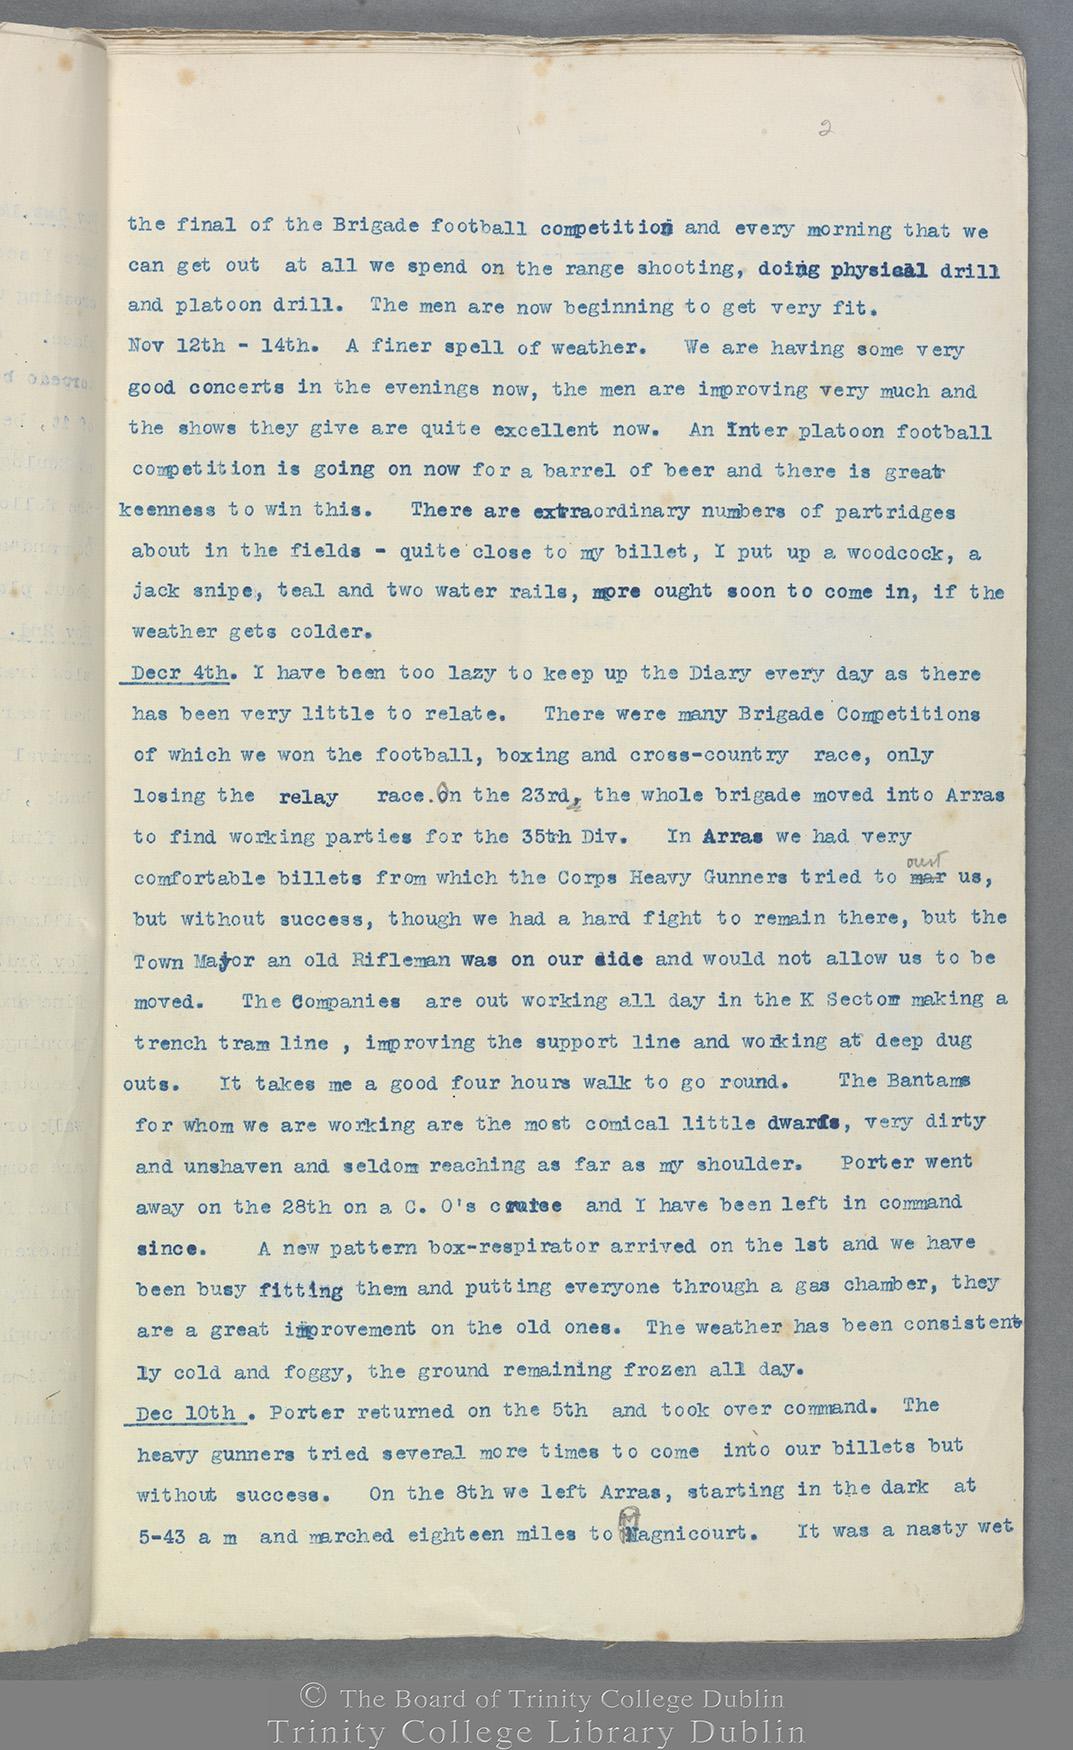 TCD MS 10822 folio 2 recto